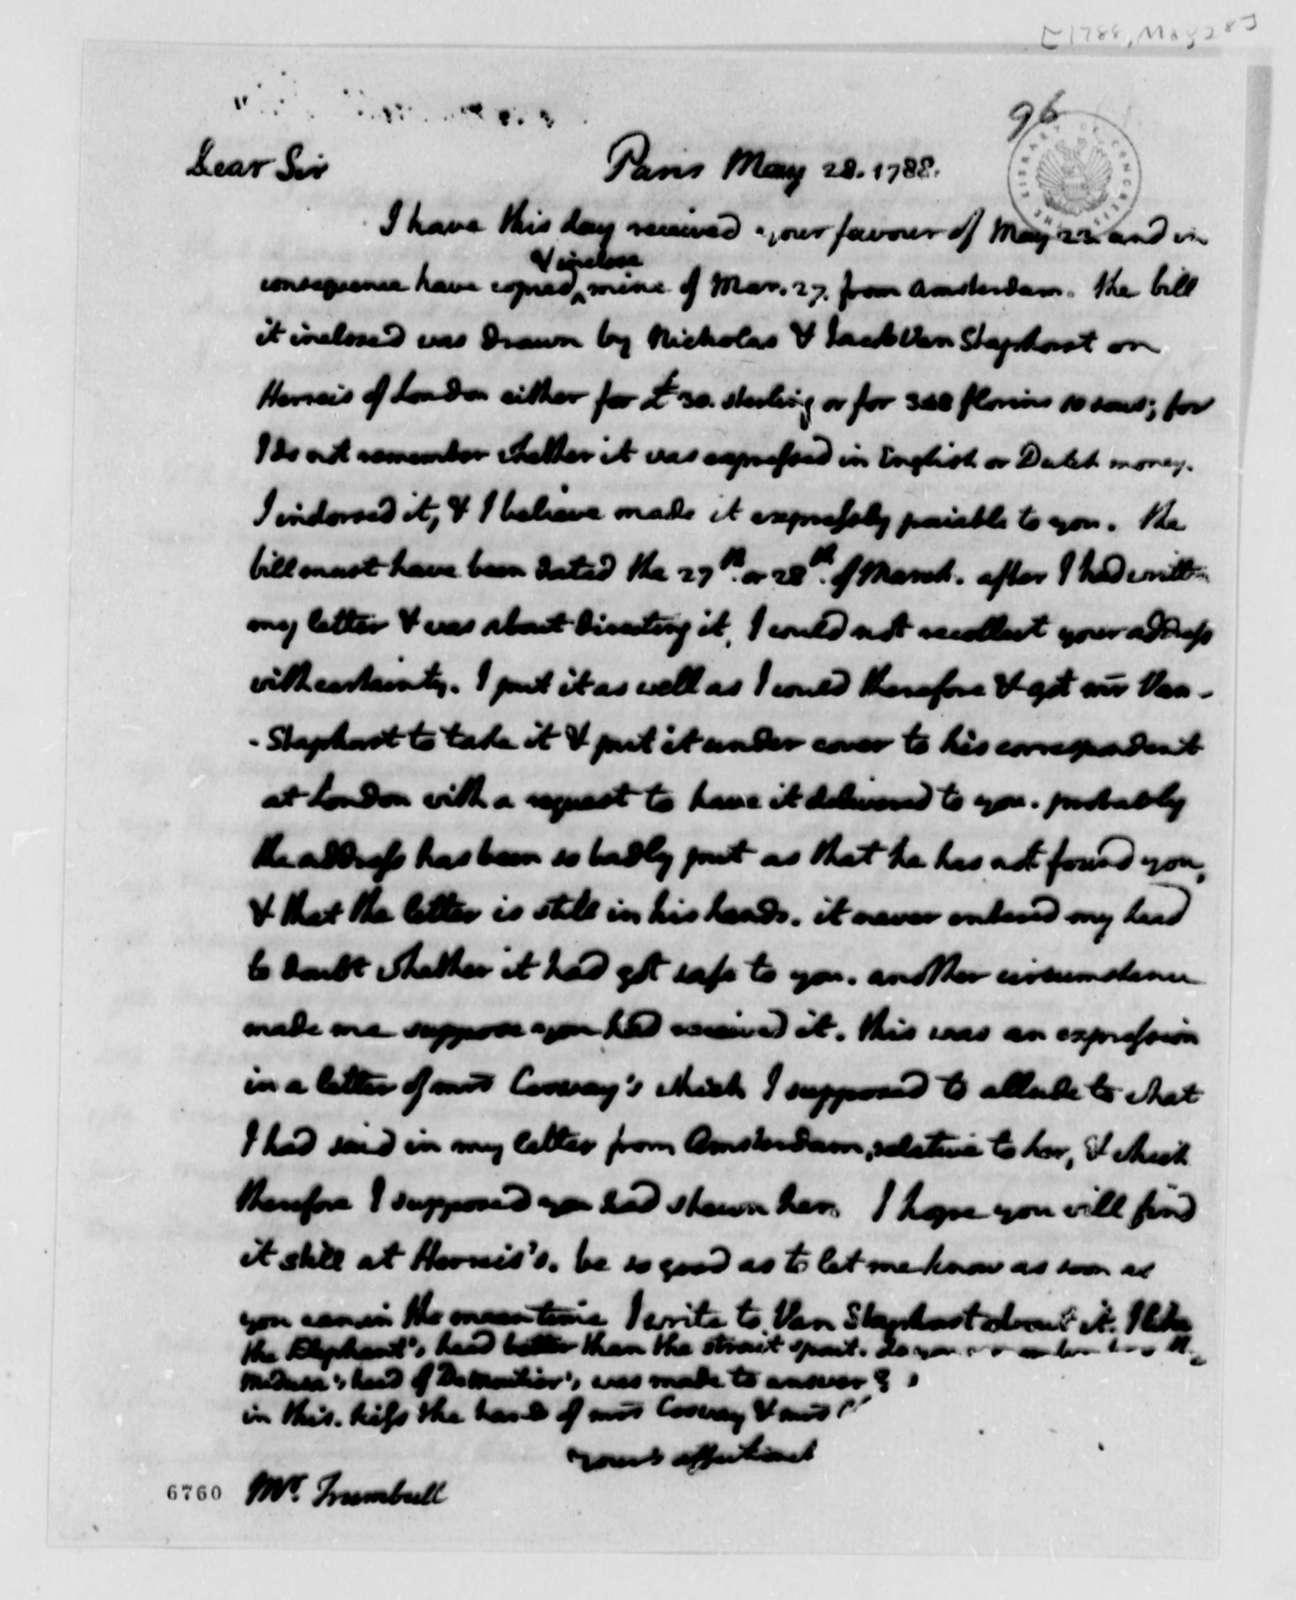 Thomas Jefferson to John Trumbull, May 28, 1788